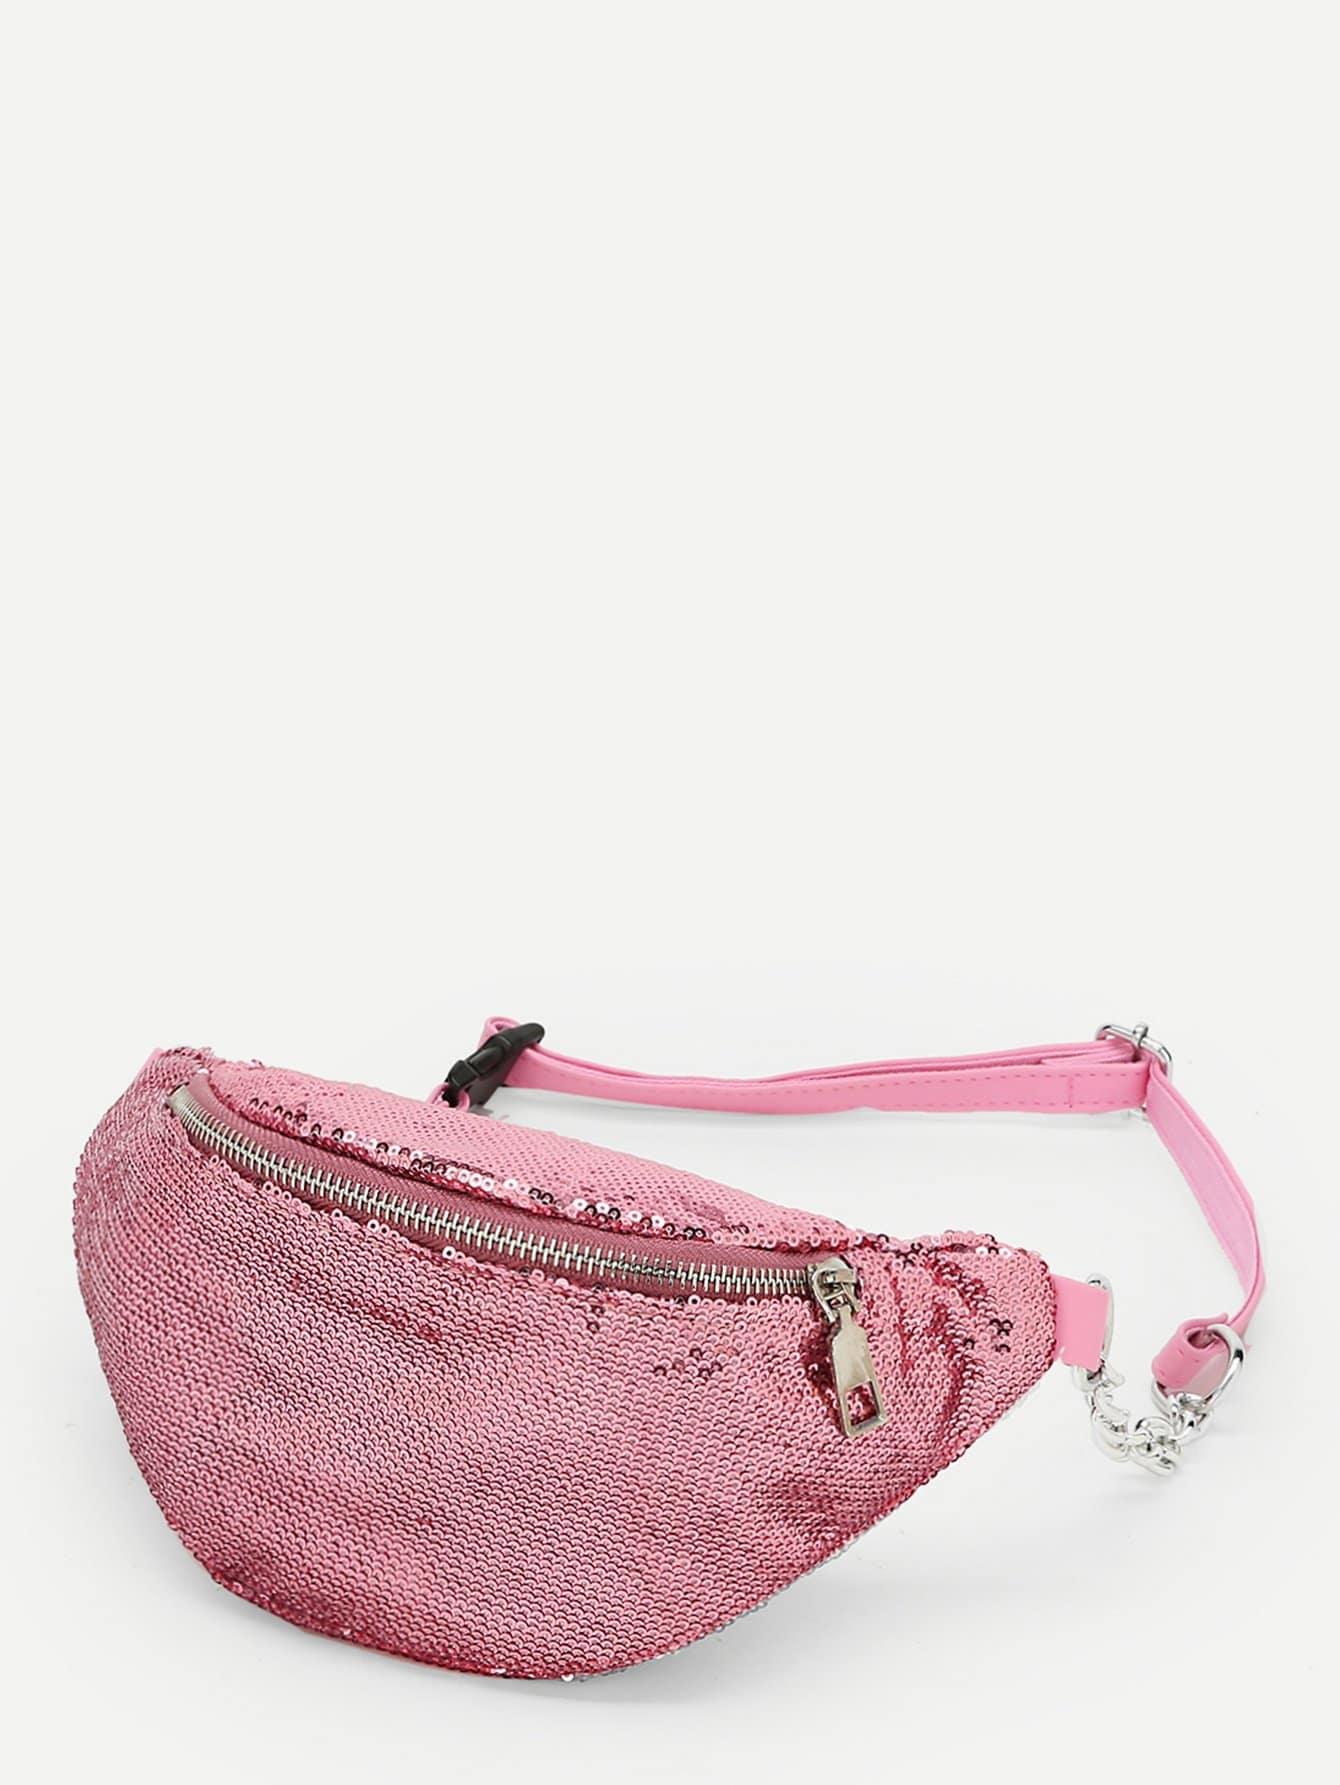 Zipper Front Sequin Overlay Bum Bag sequin overlay triangle design necklace